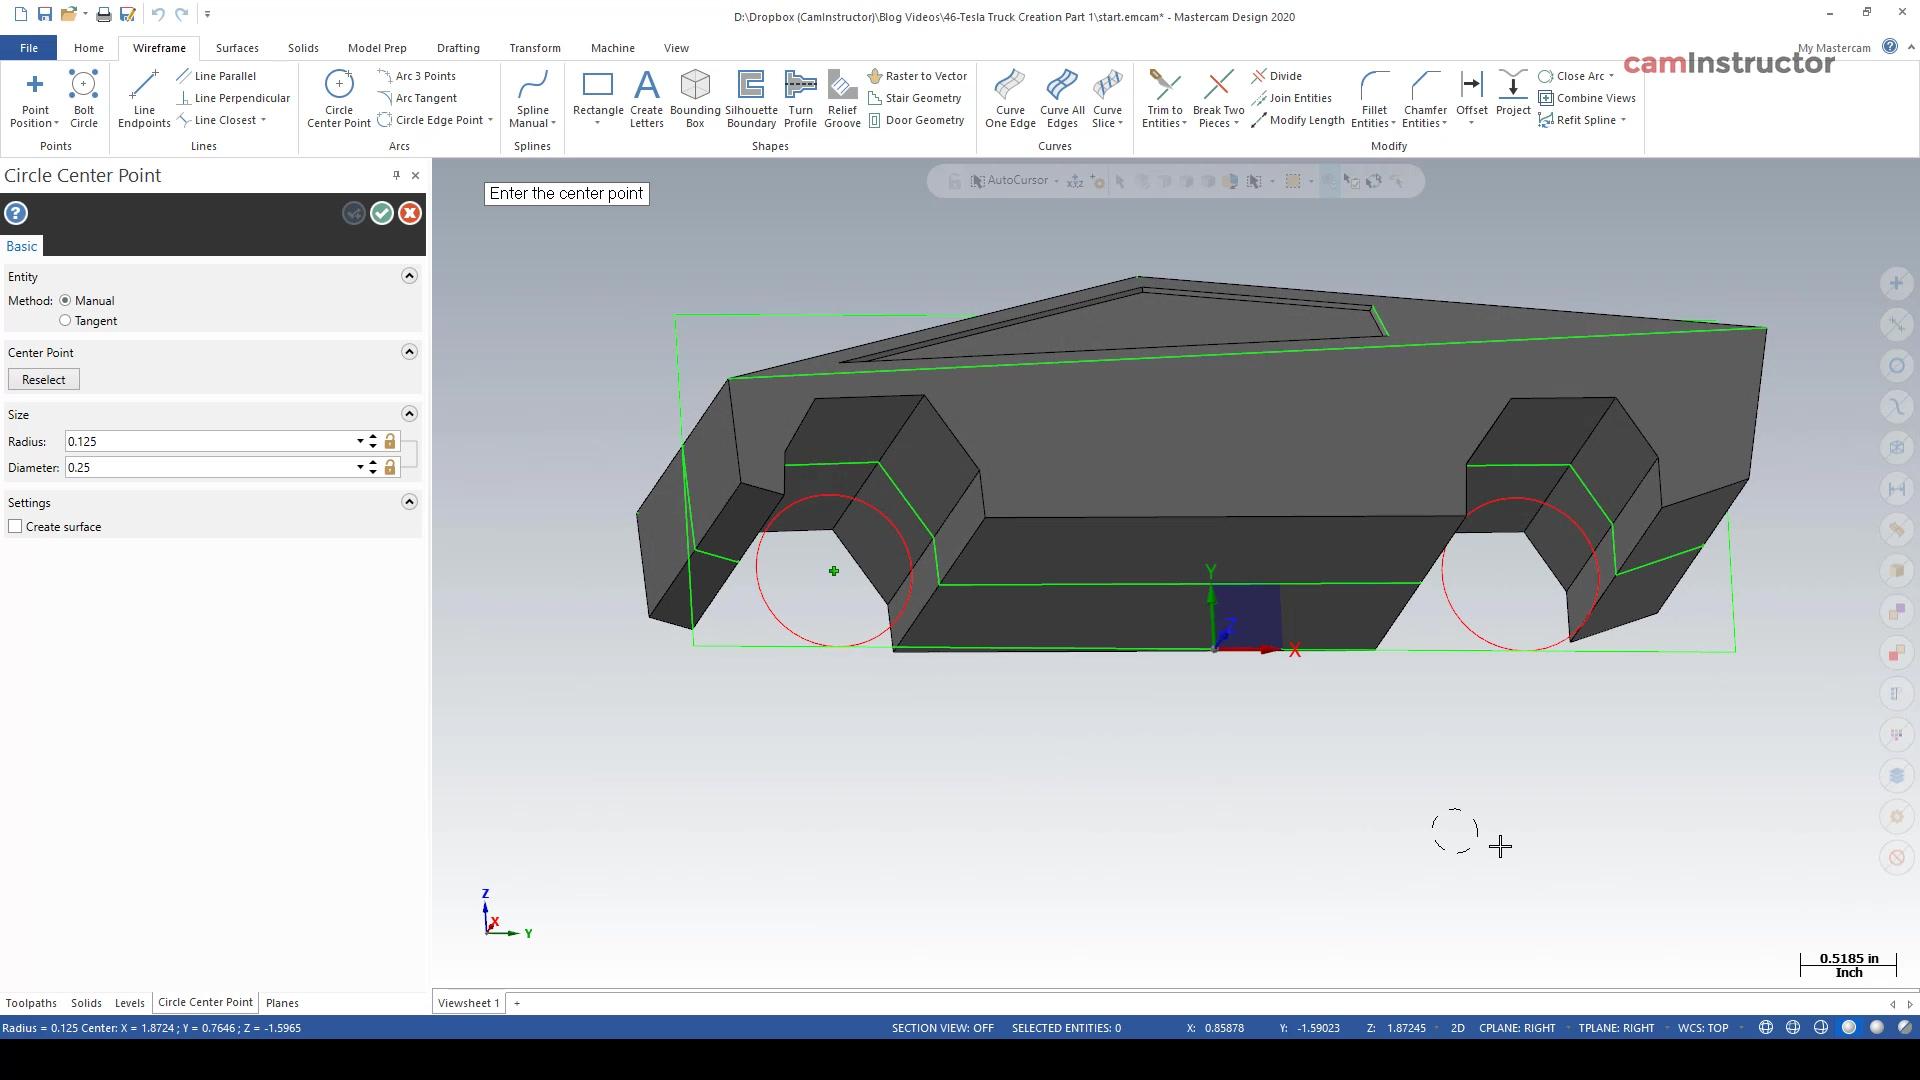 Tesla Truck Creation Part 4